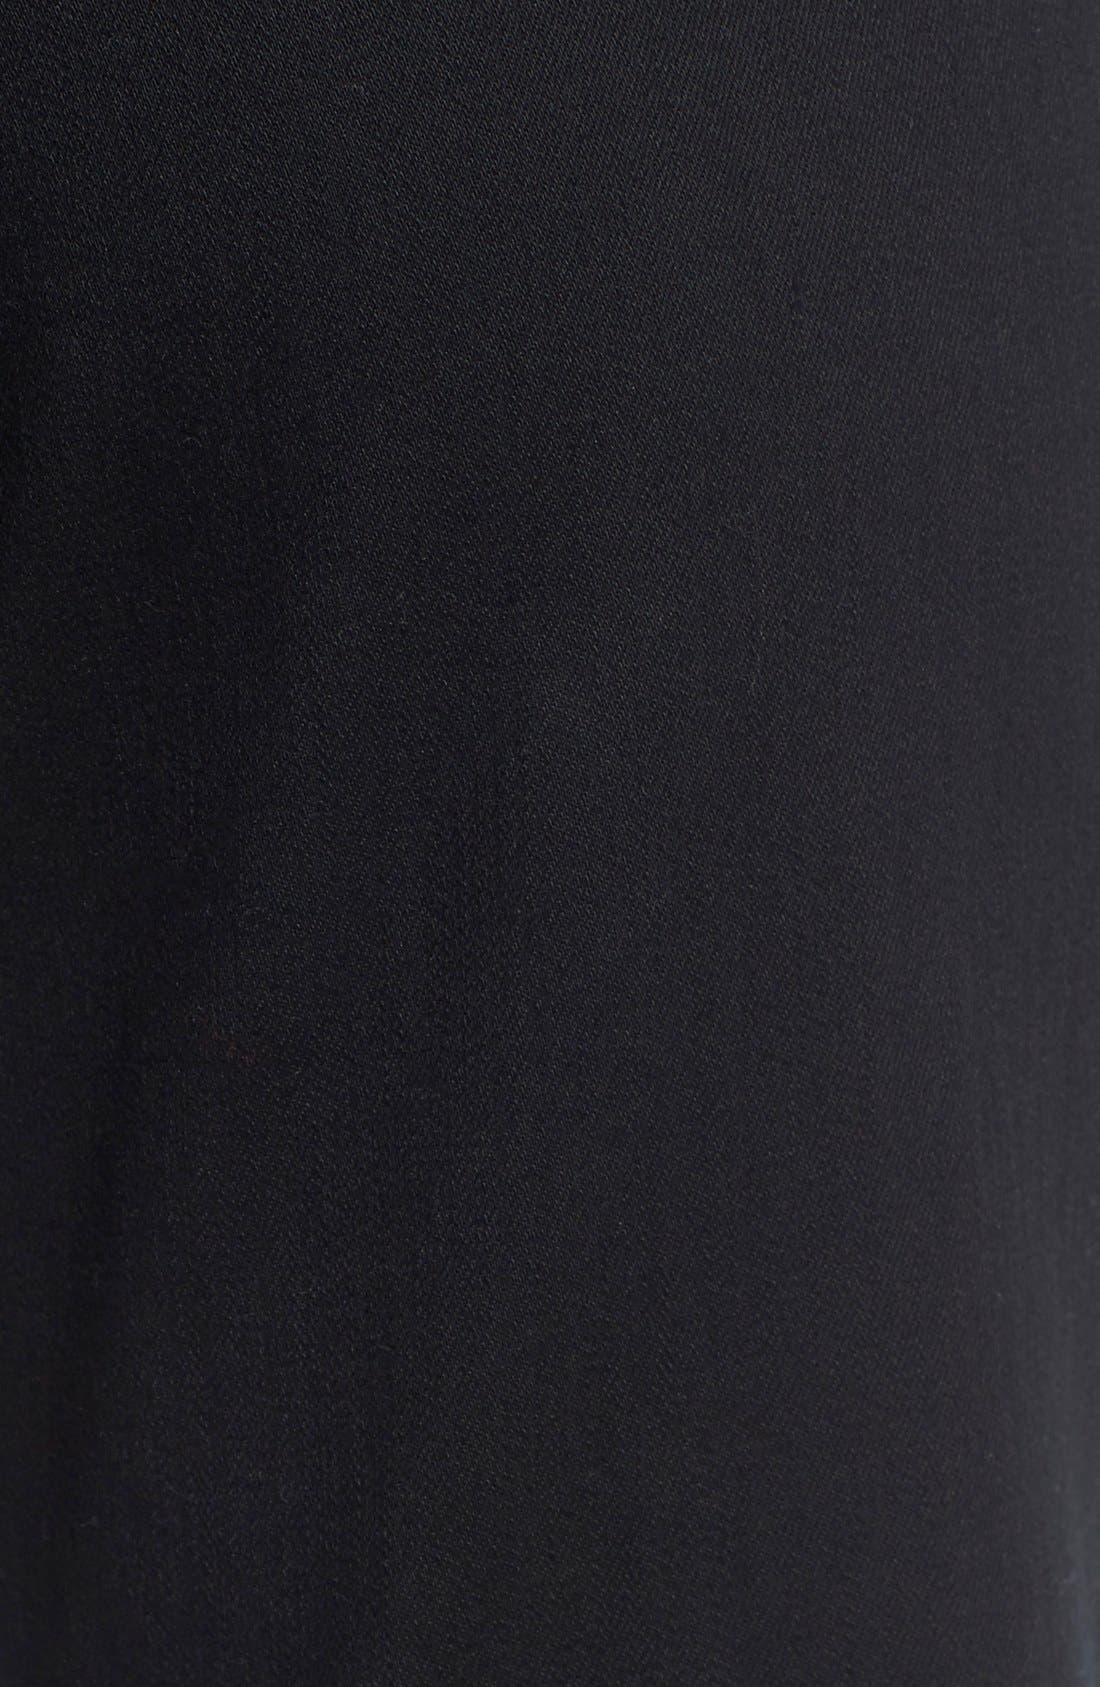 'Dayla' Colored Wide Cuff Capri Jeans,                             Alternate thumbnail 3, color,                             001